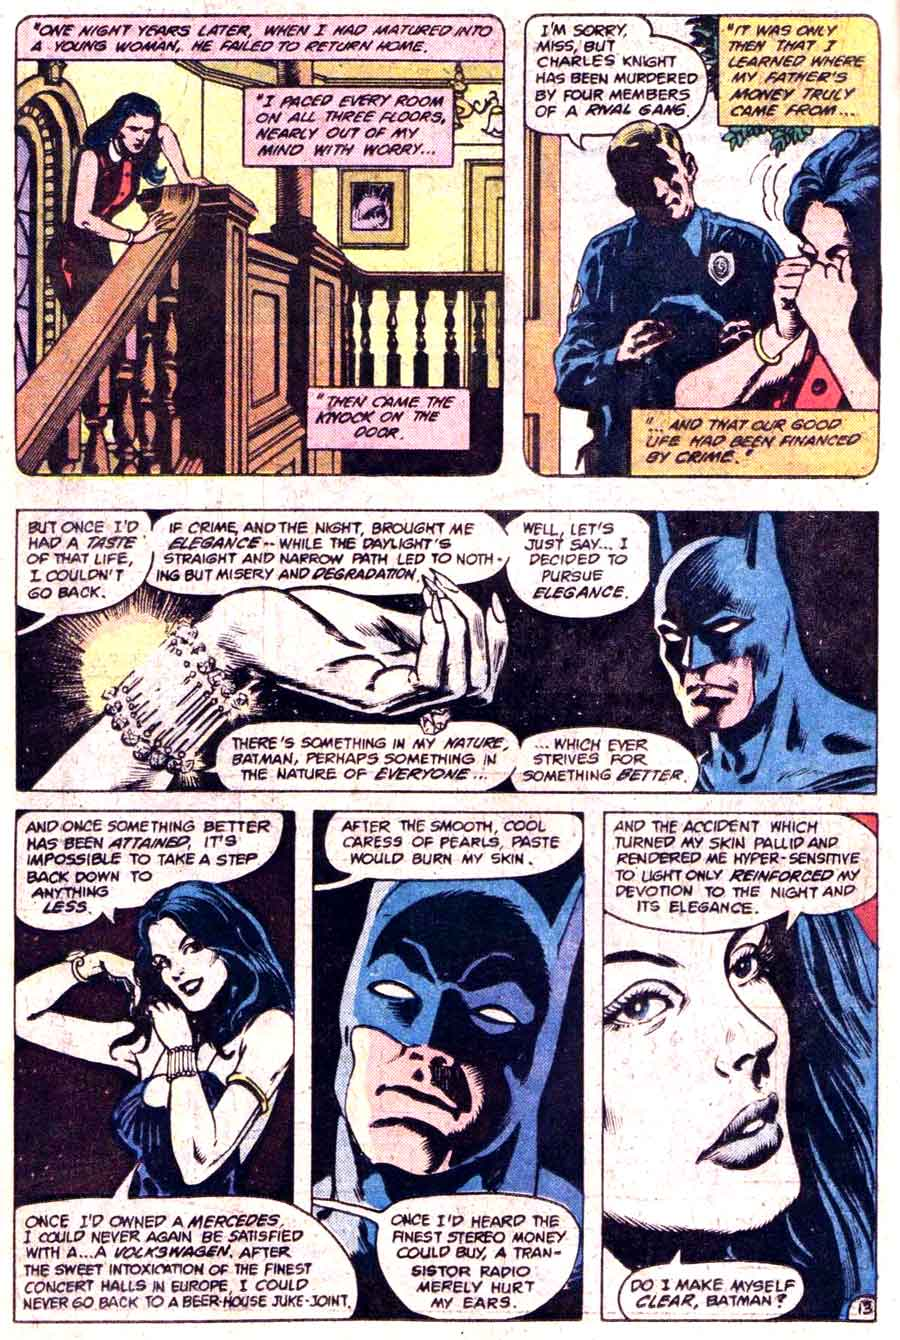 Batman #363 1st nocturna dc 1980s comic book page art by Don Newton